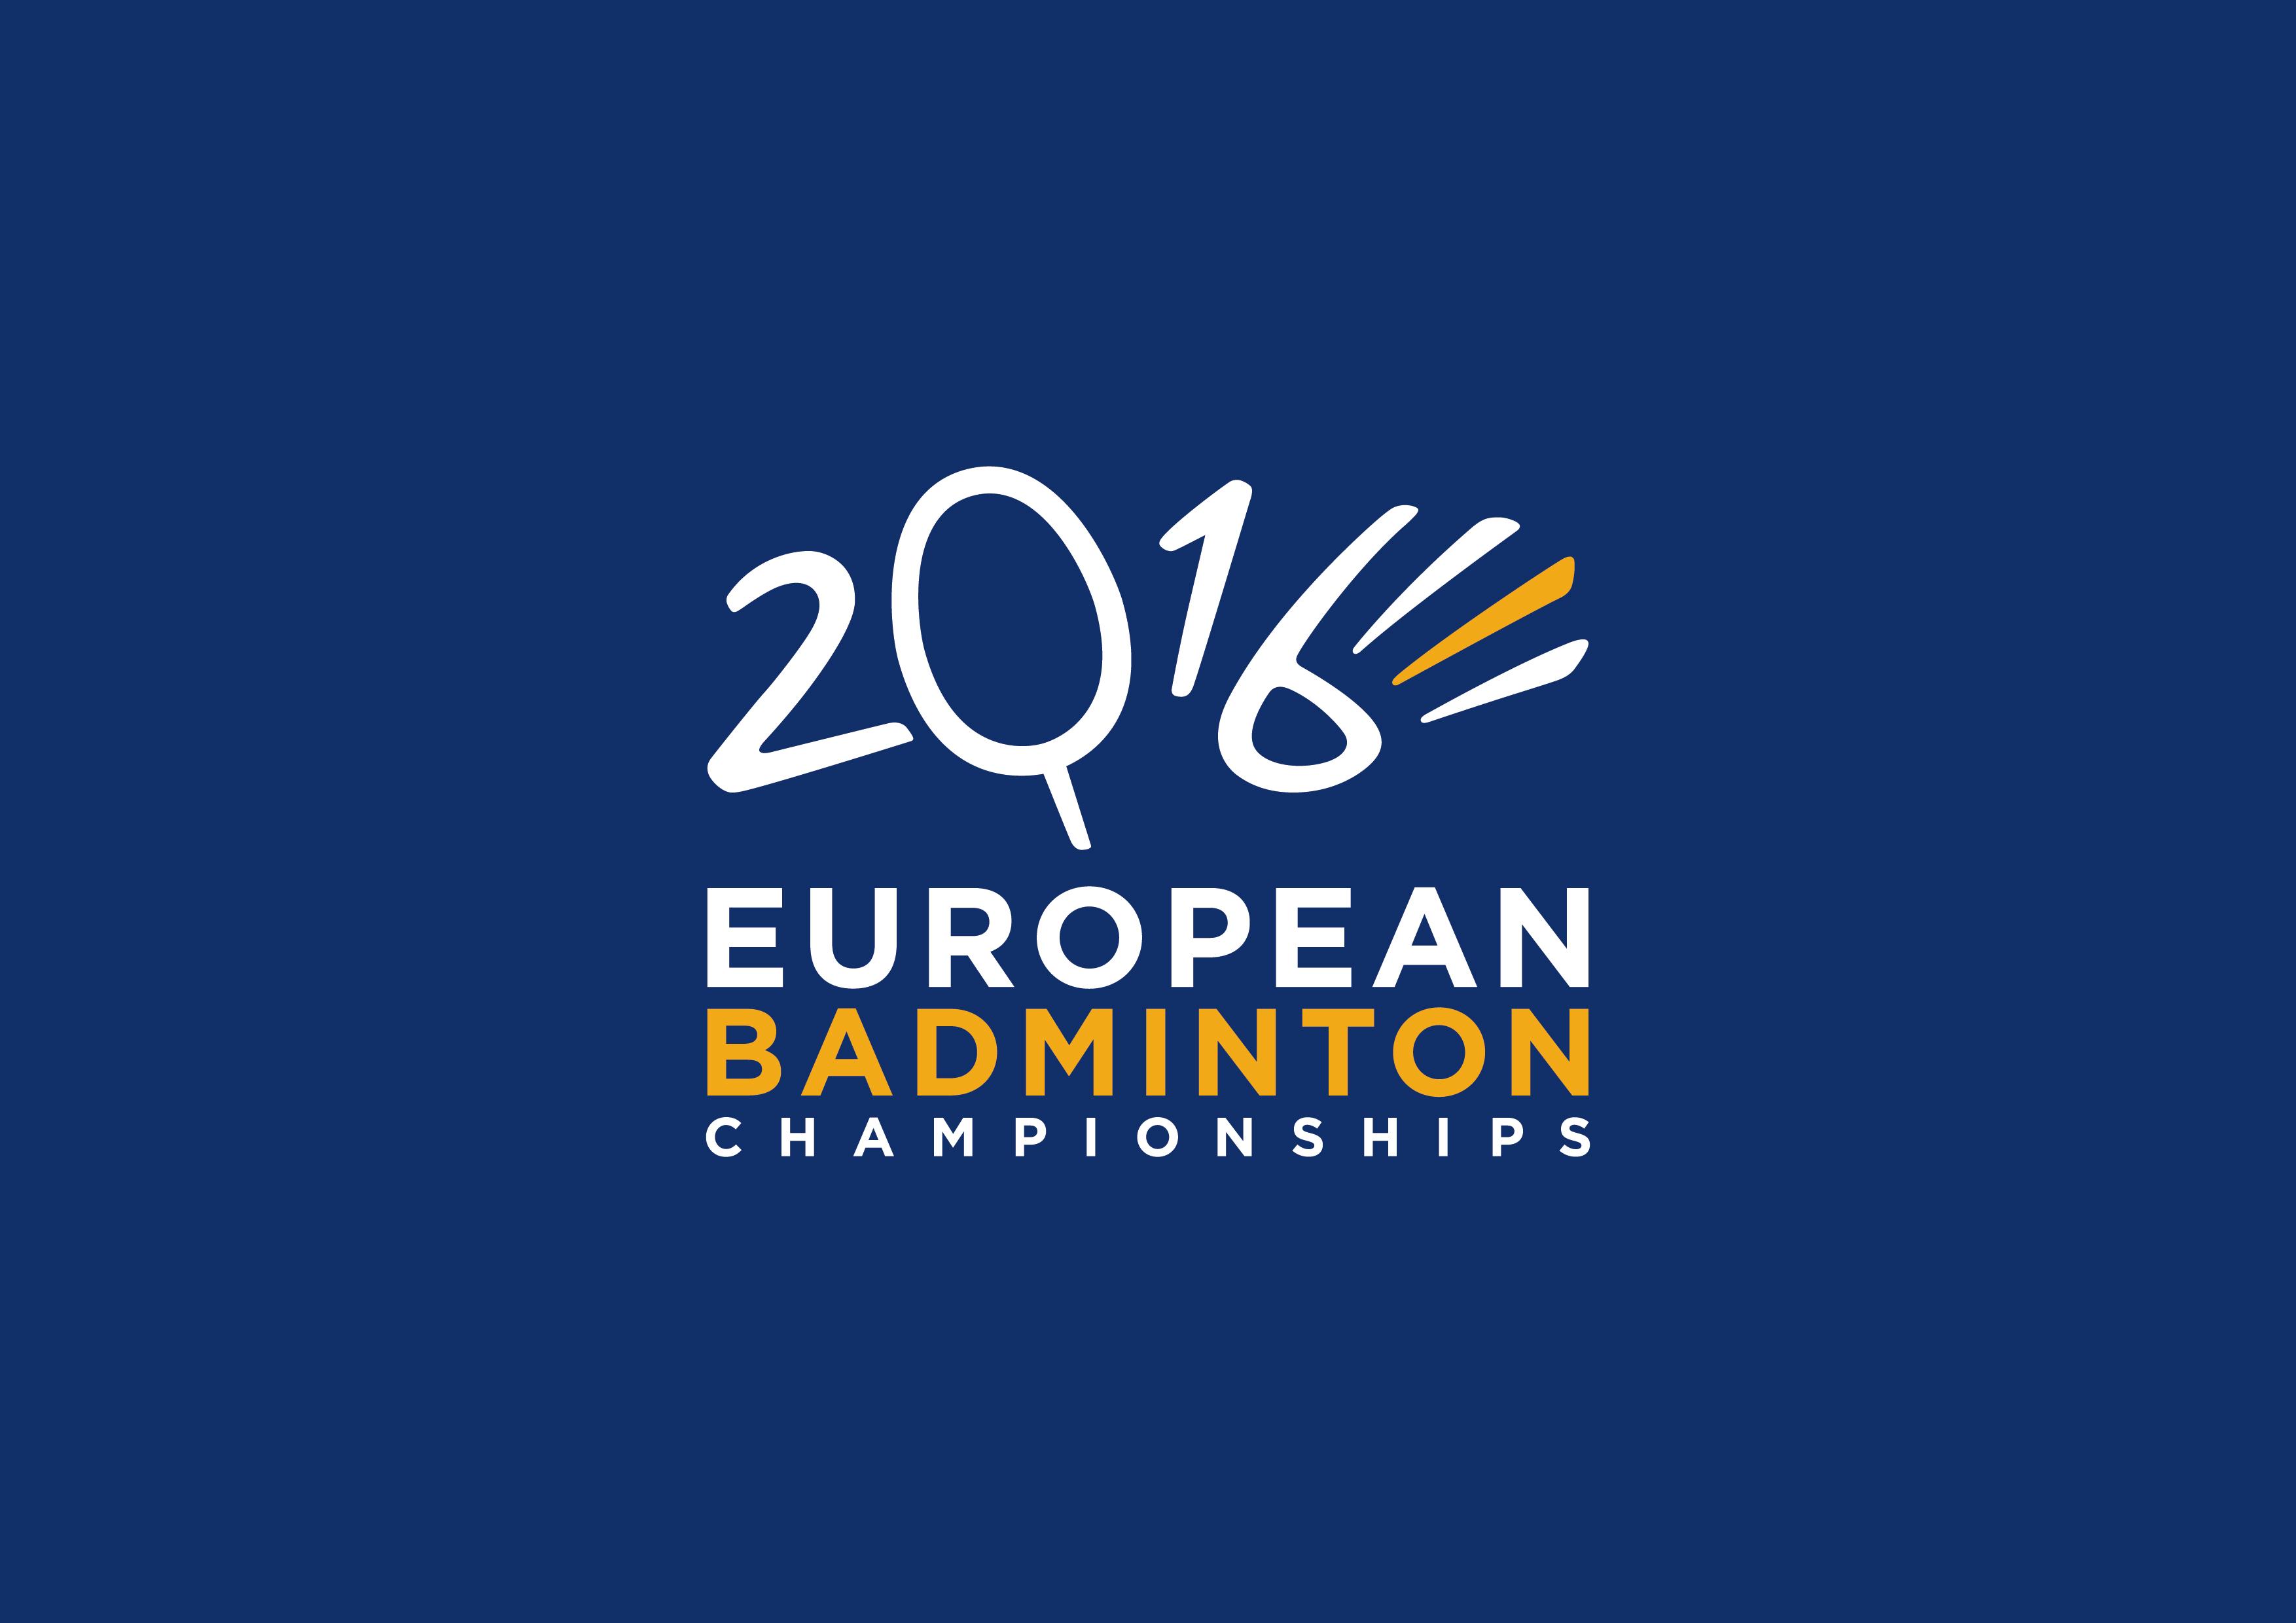 European Championships 2016